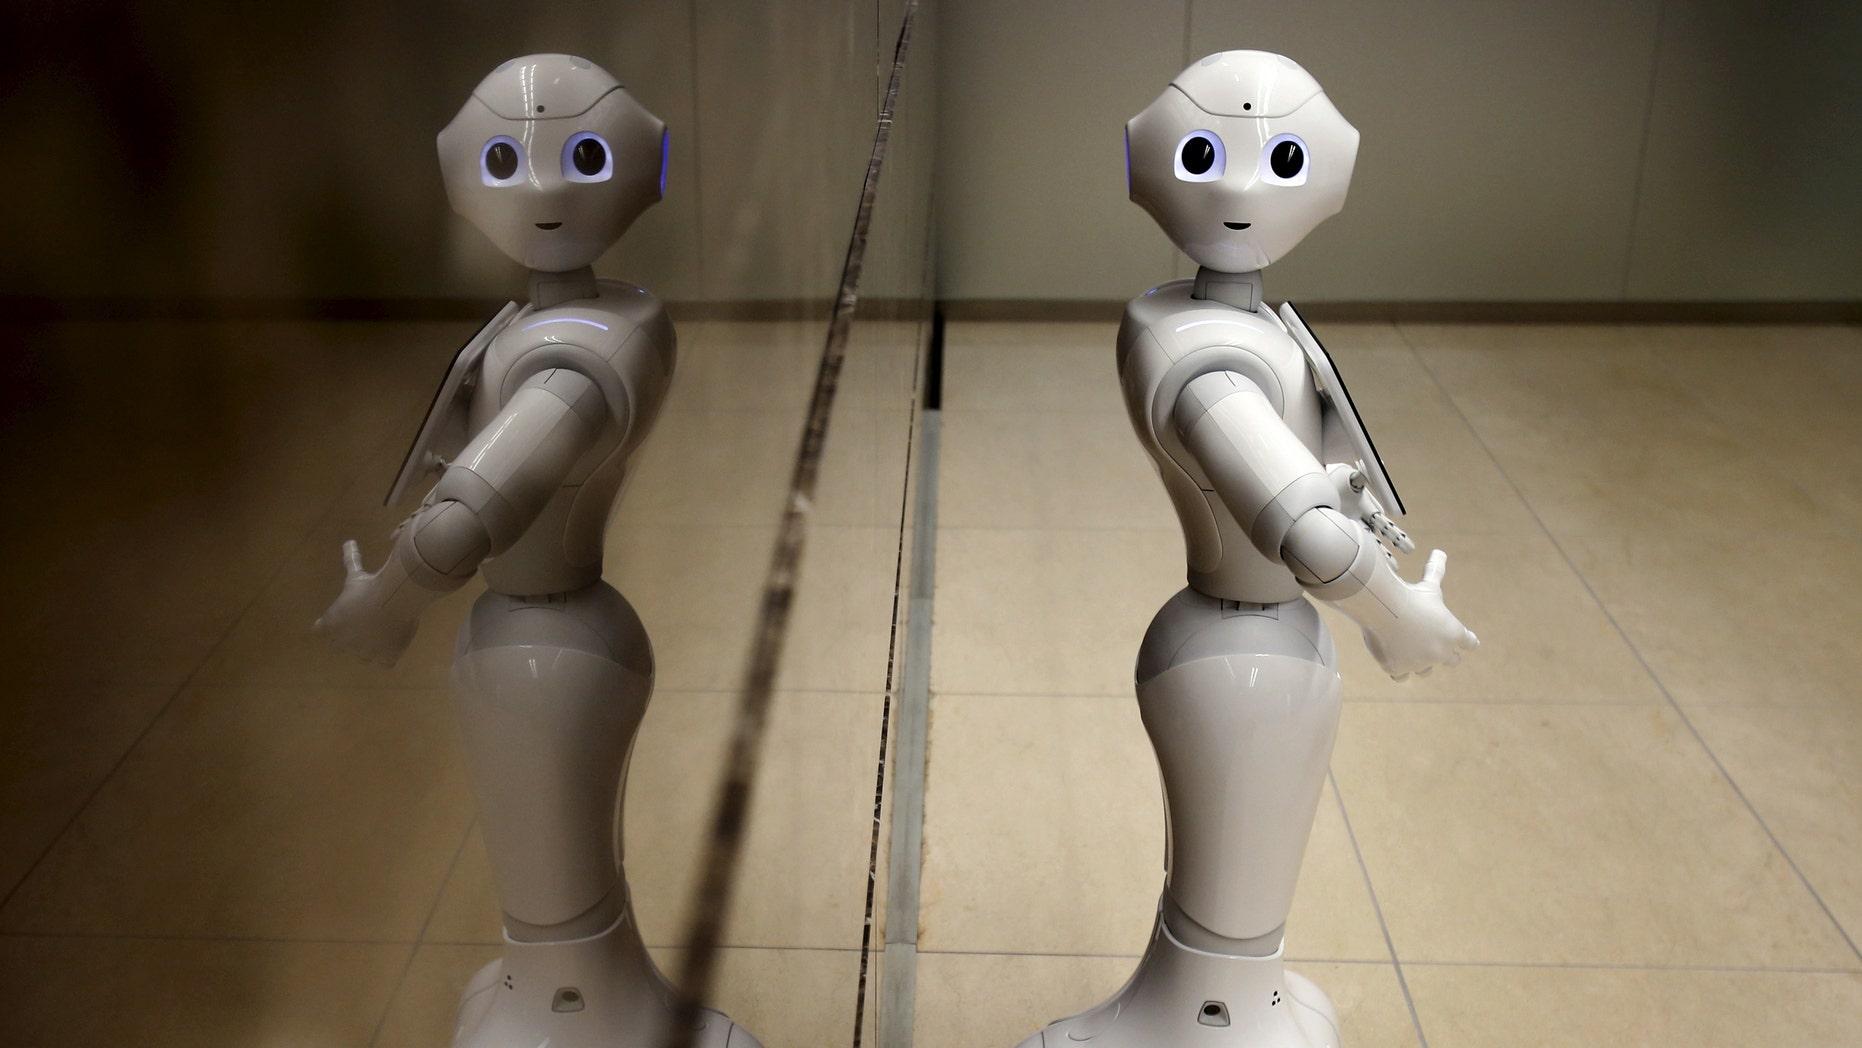 File photo - SoftBank's human-like robot named 'Pepper'.